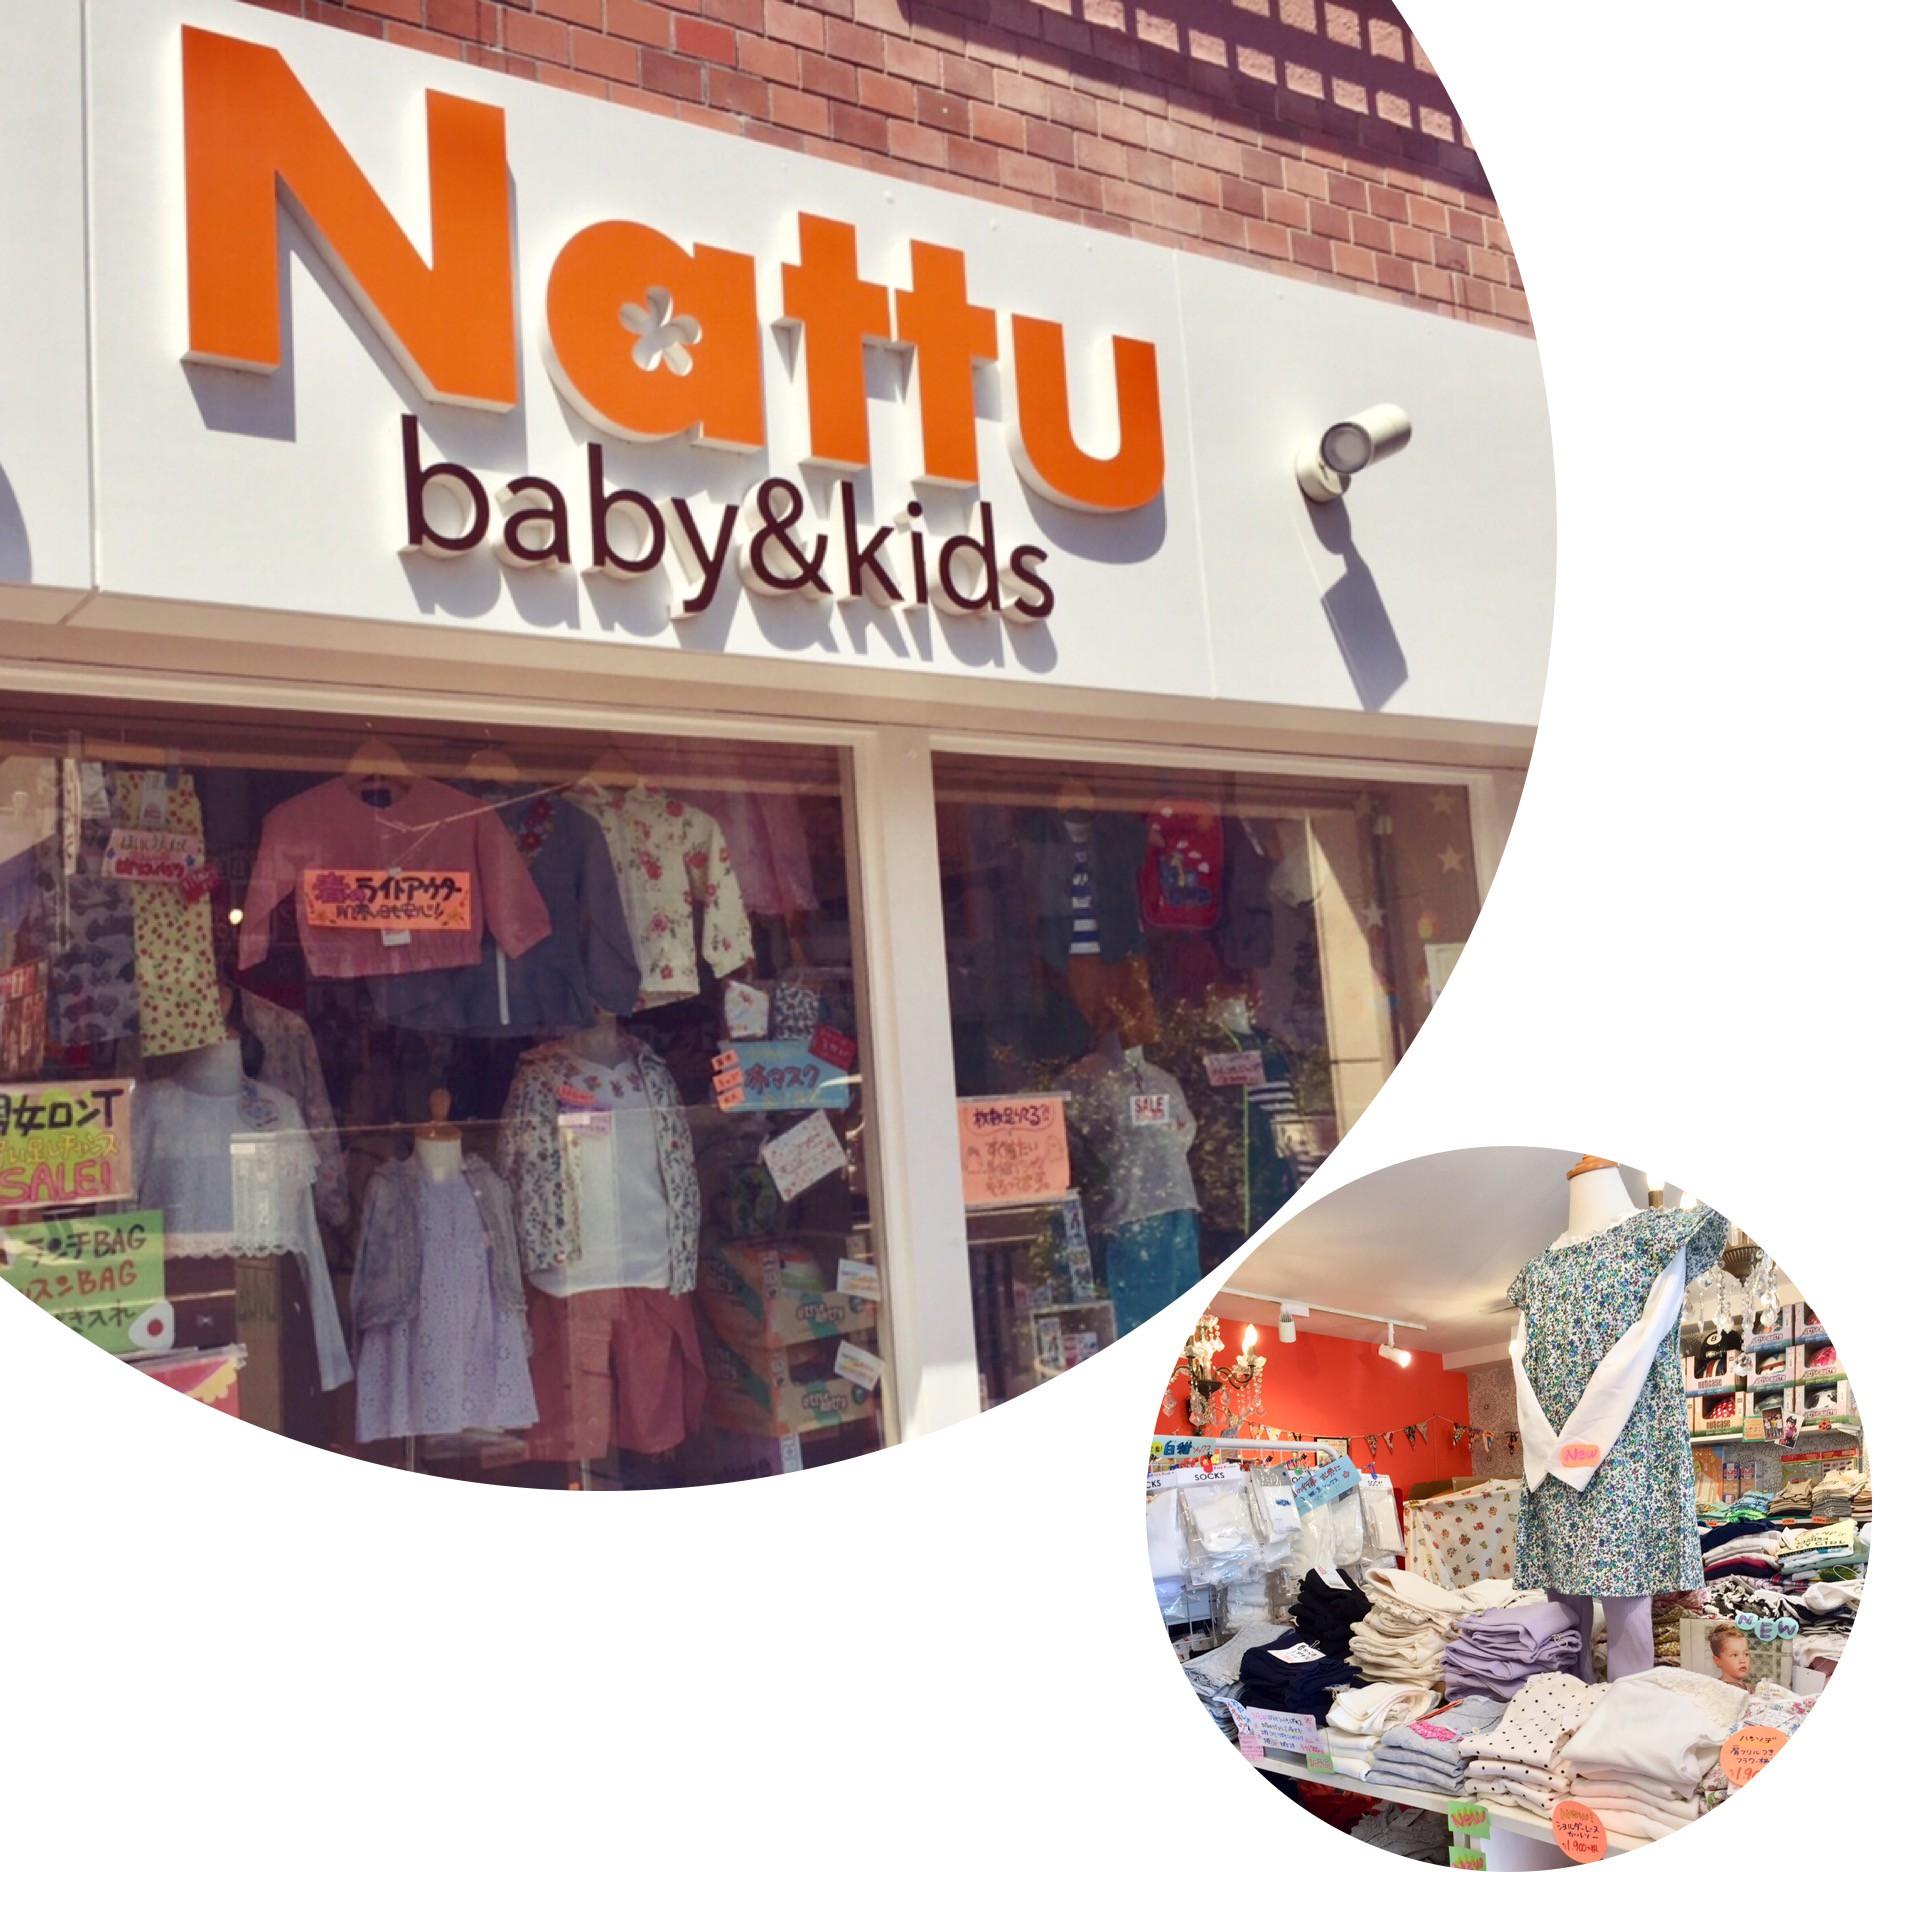 Nattu~目黒通りのベビー服子供服セレクトショップ